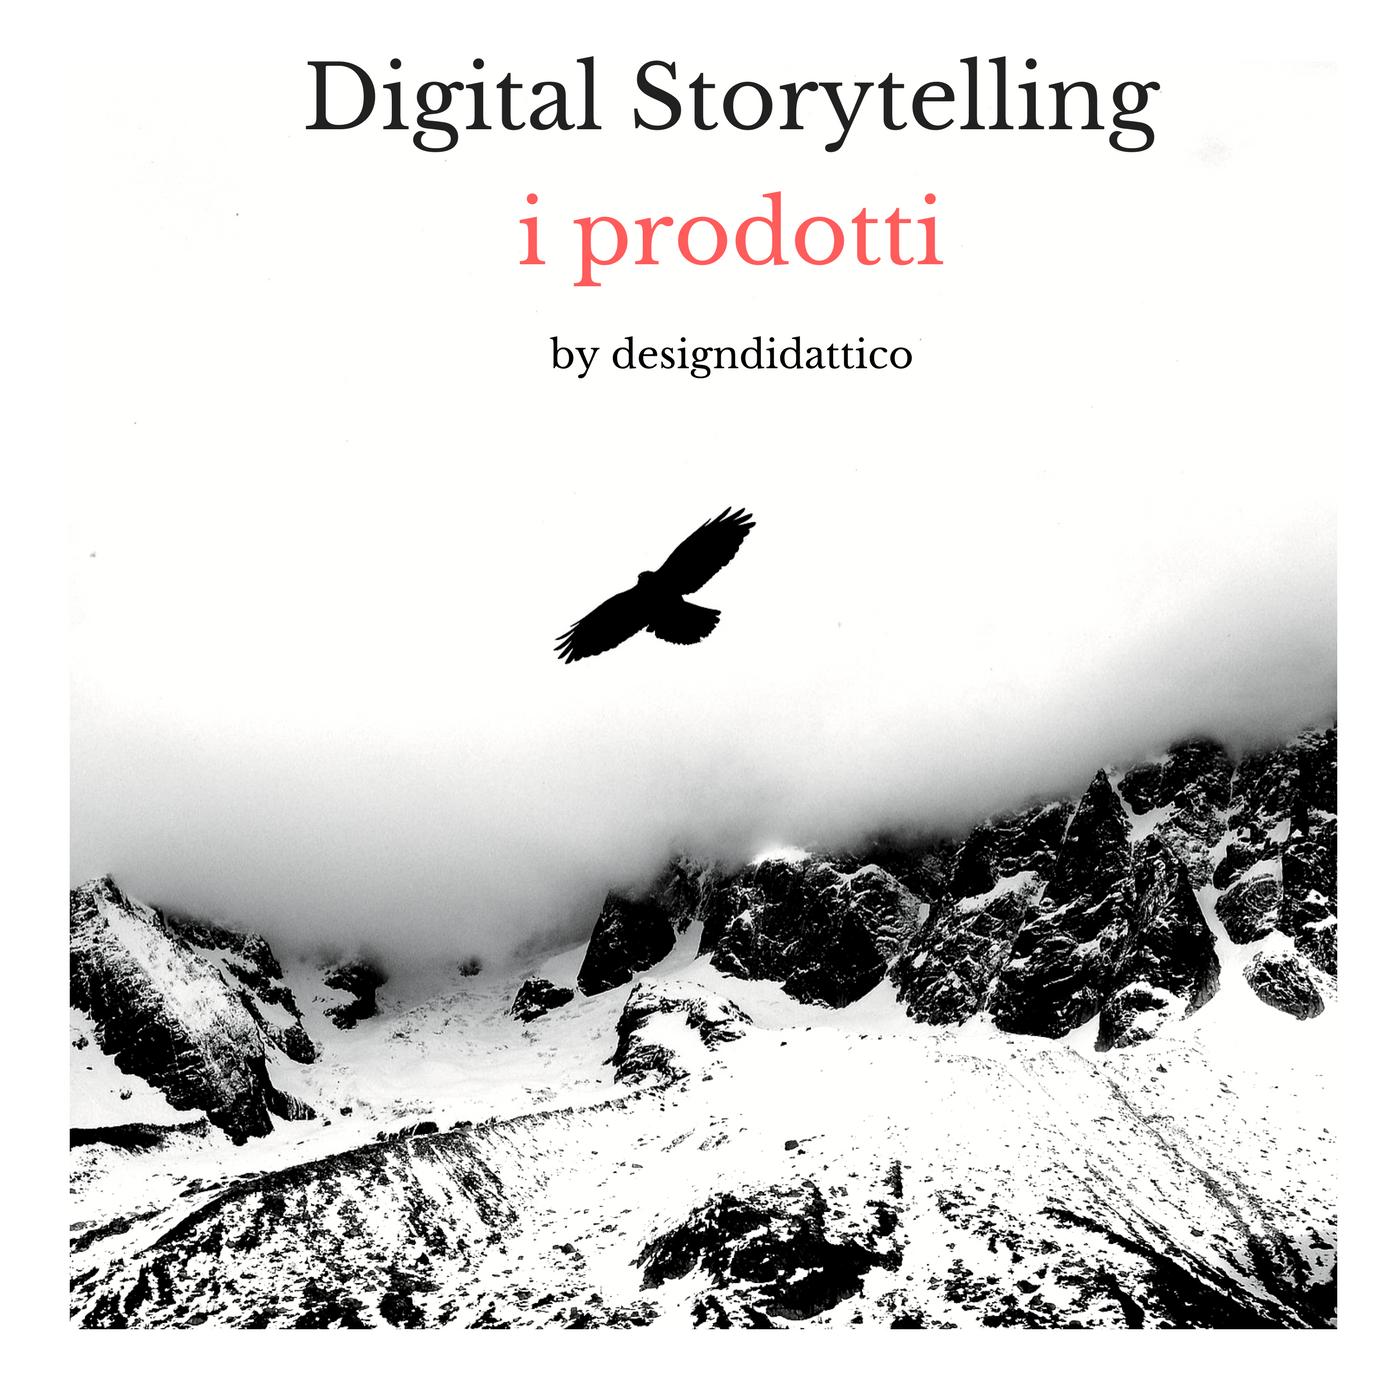 download freud a modern reader whurr series